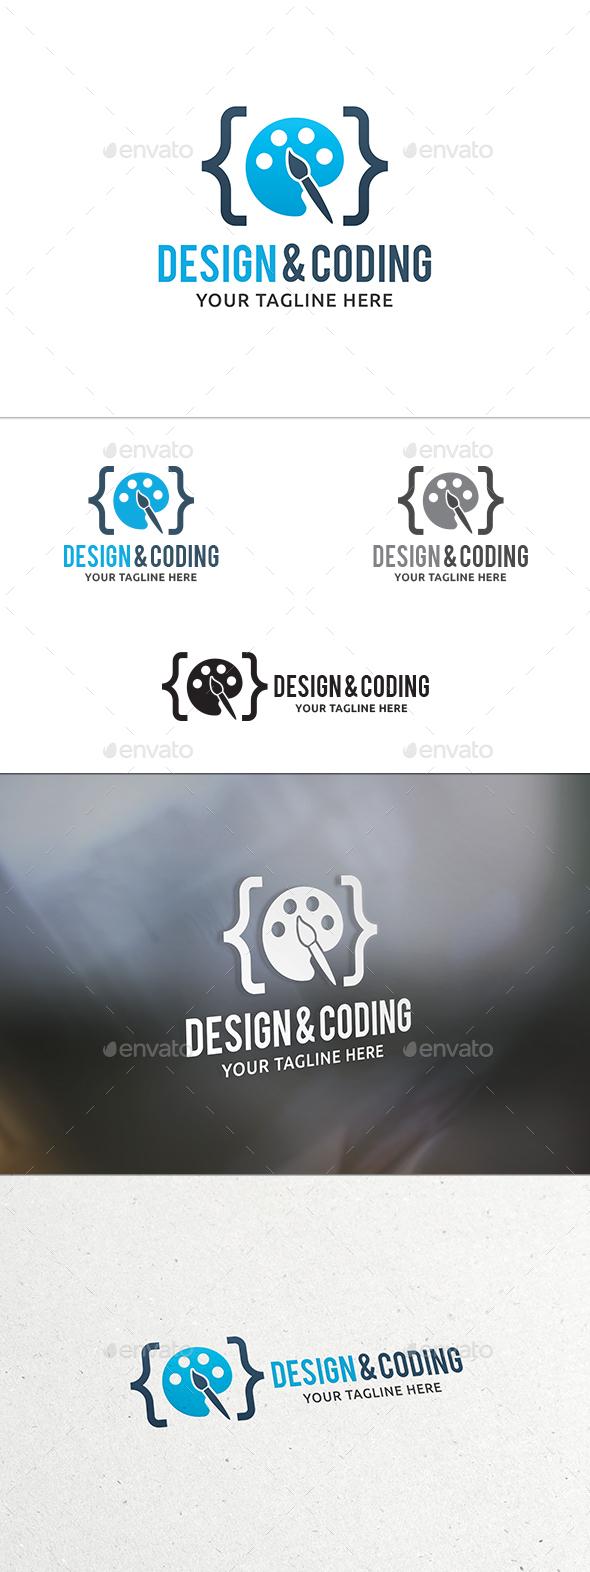 Design & Coding Logo